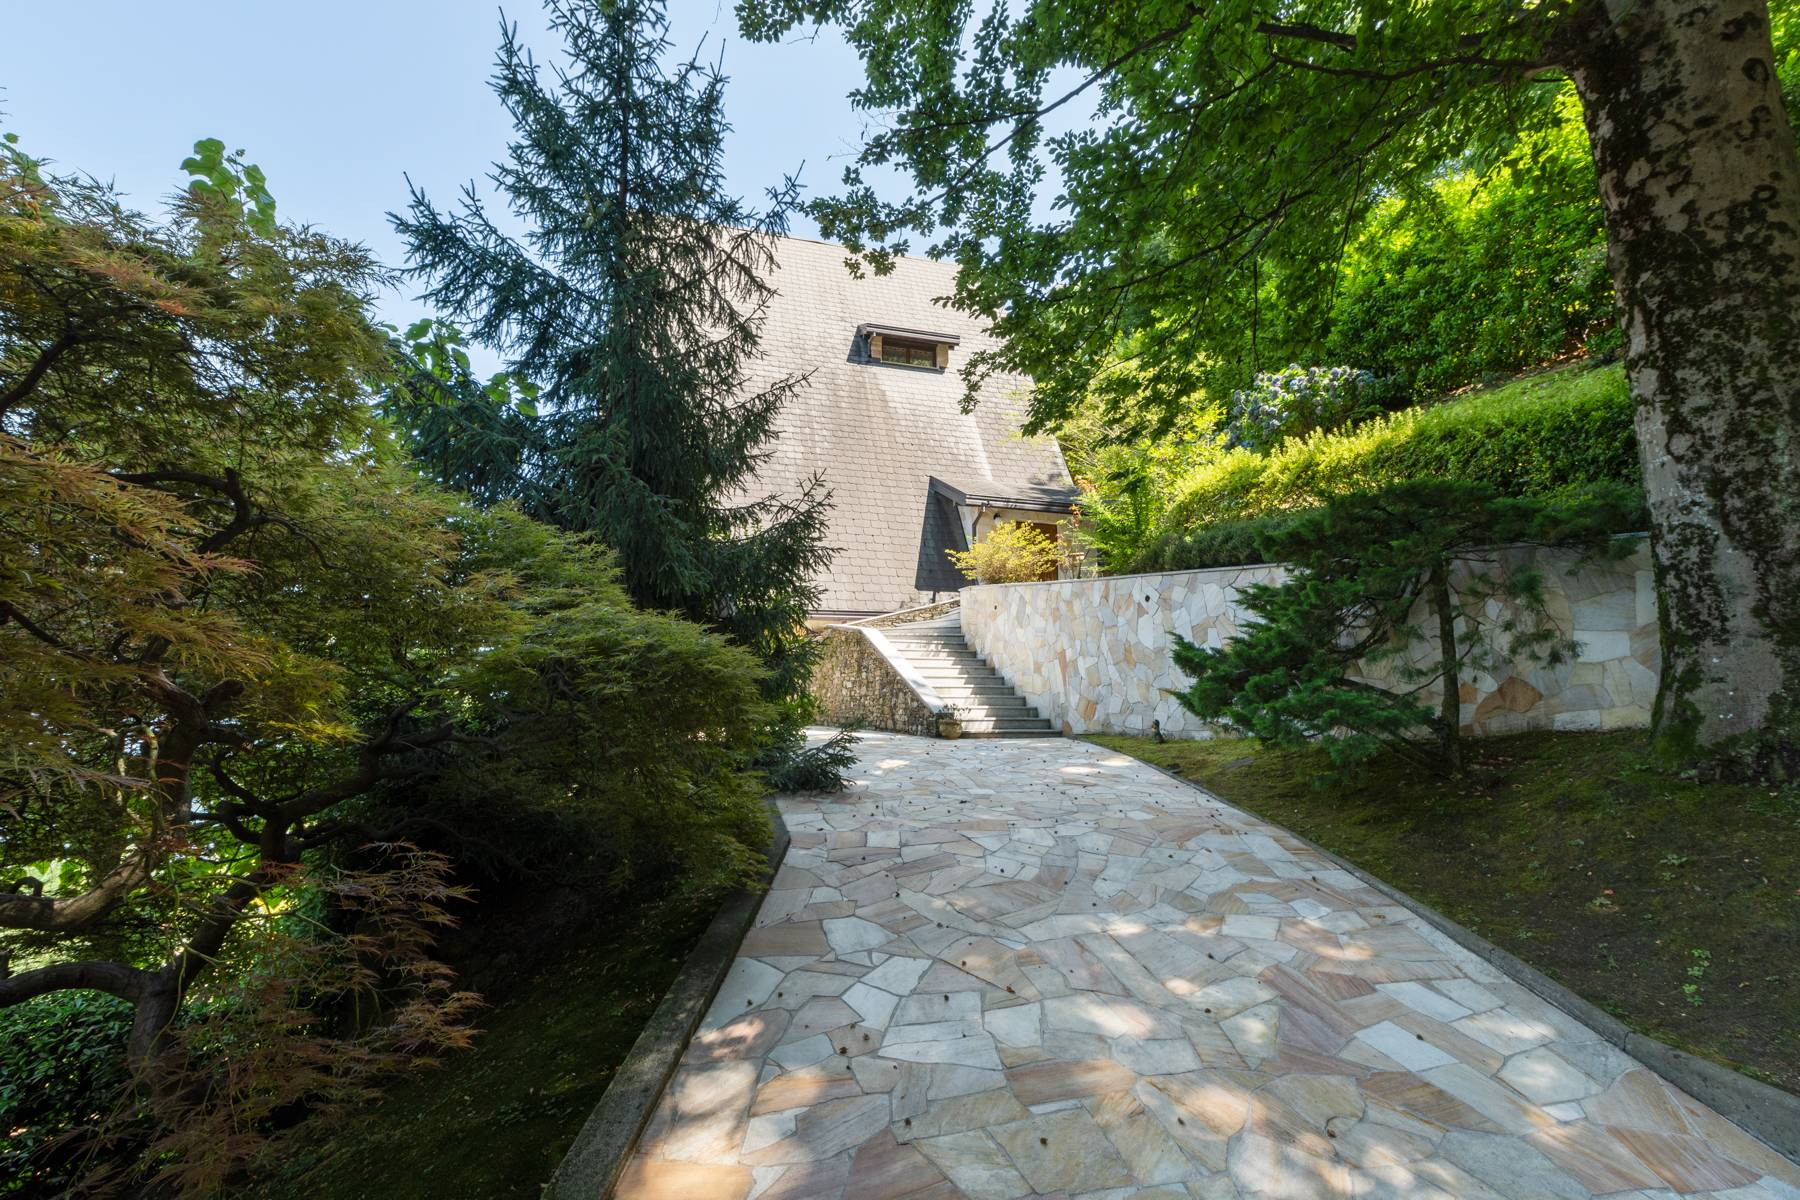 Villa in Vendita a Stresa: 5 locali, 364 mq - Foto 25